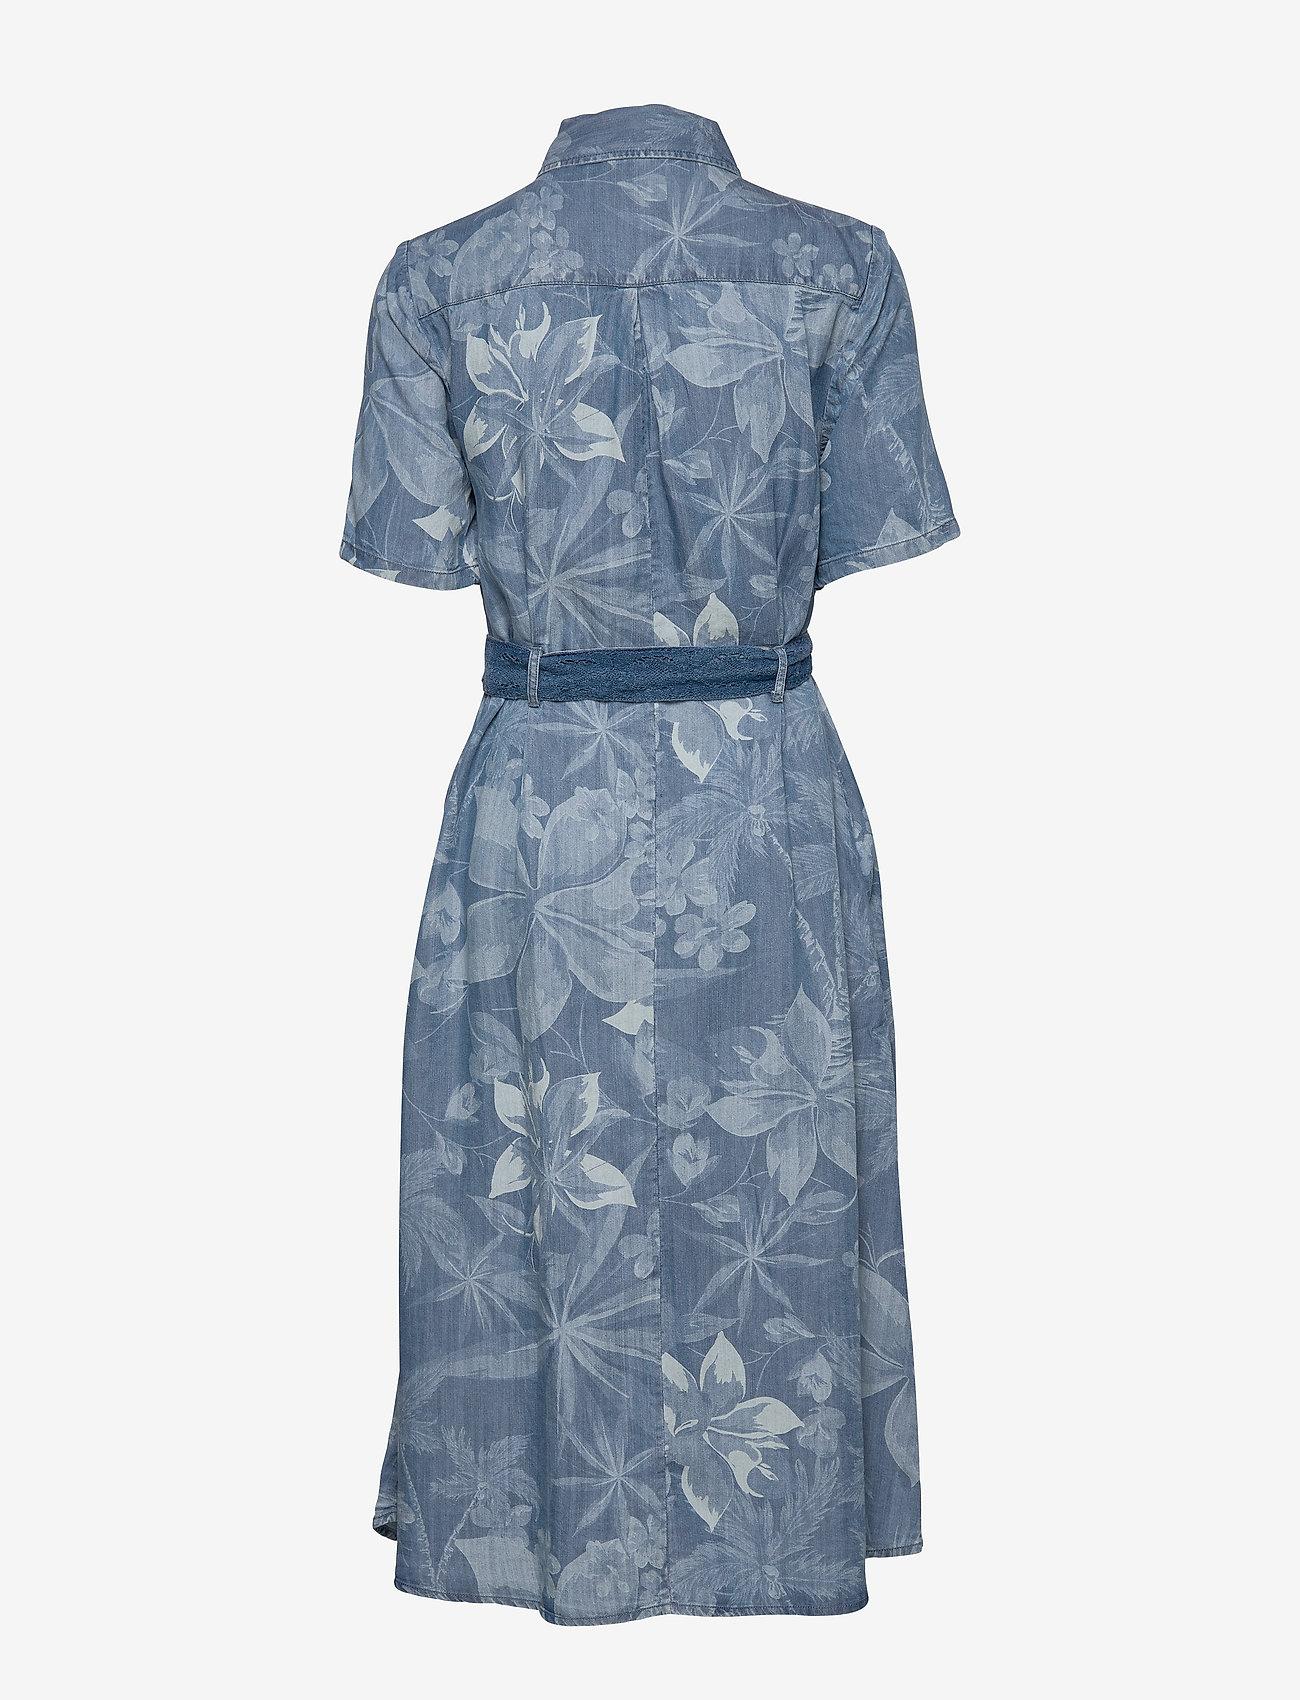 Desigual - VEST KATE - blousejurken - multicolor azul - 1